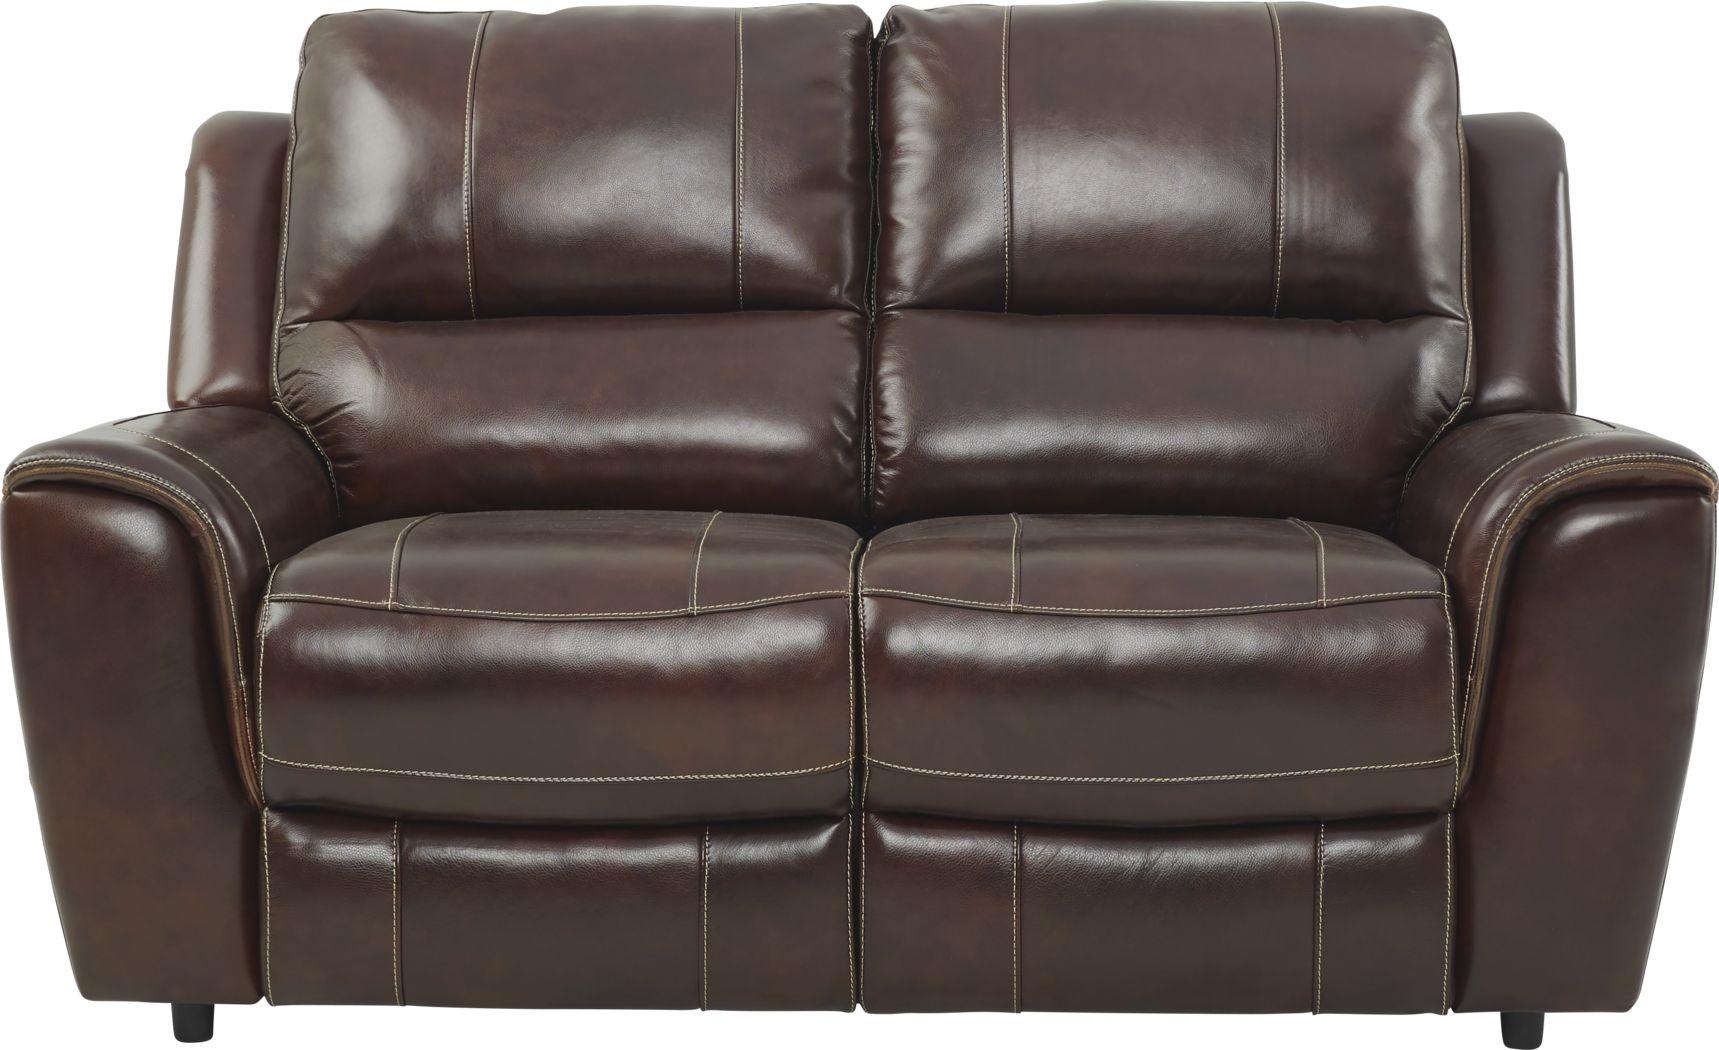 Lanzo Merlot Leather Loveseat